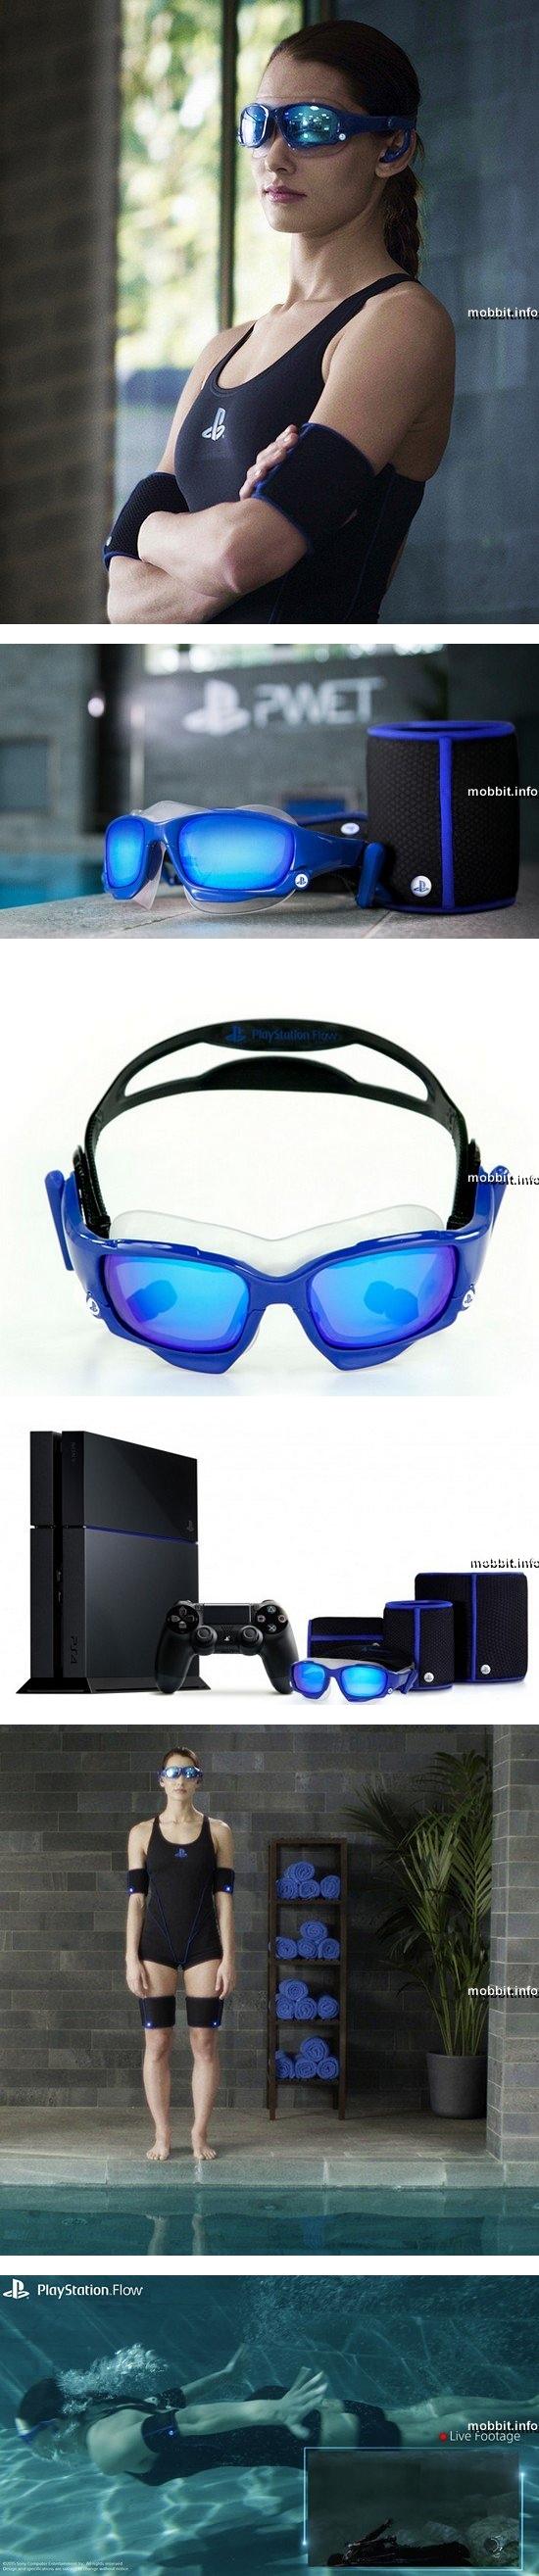 Sony PlayStation Flow